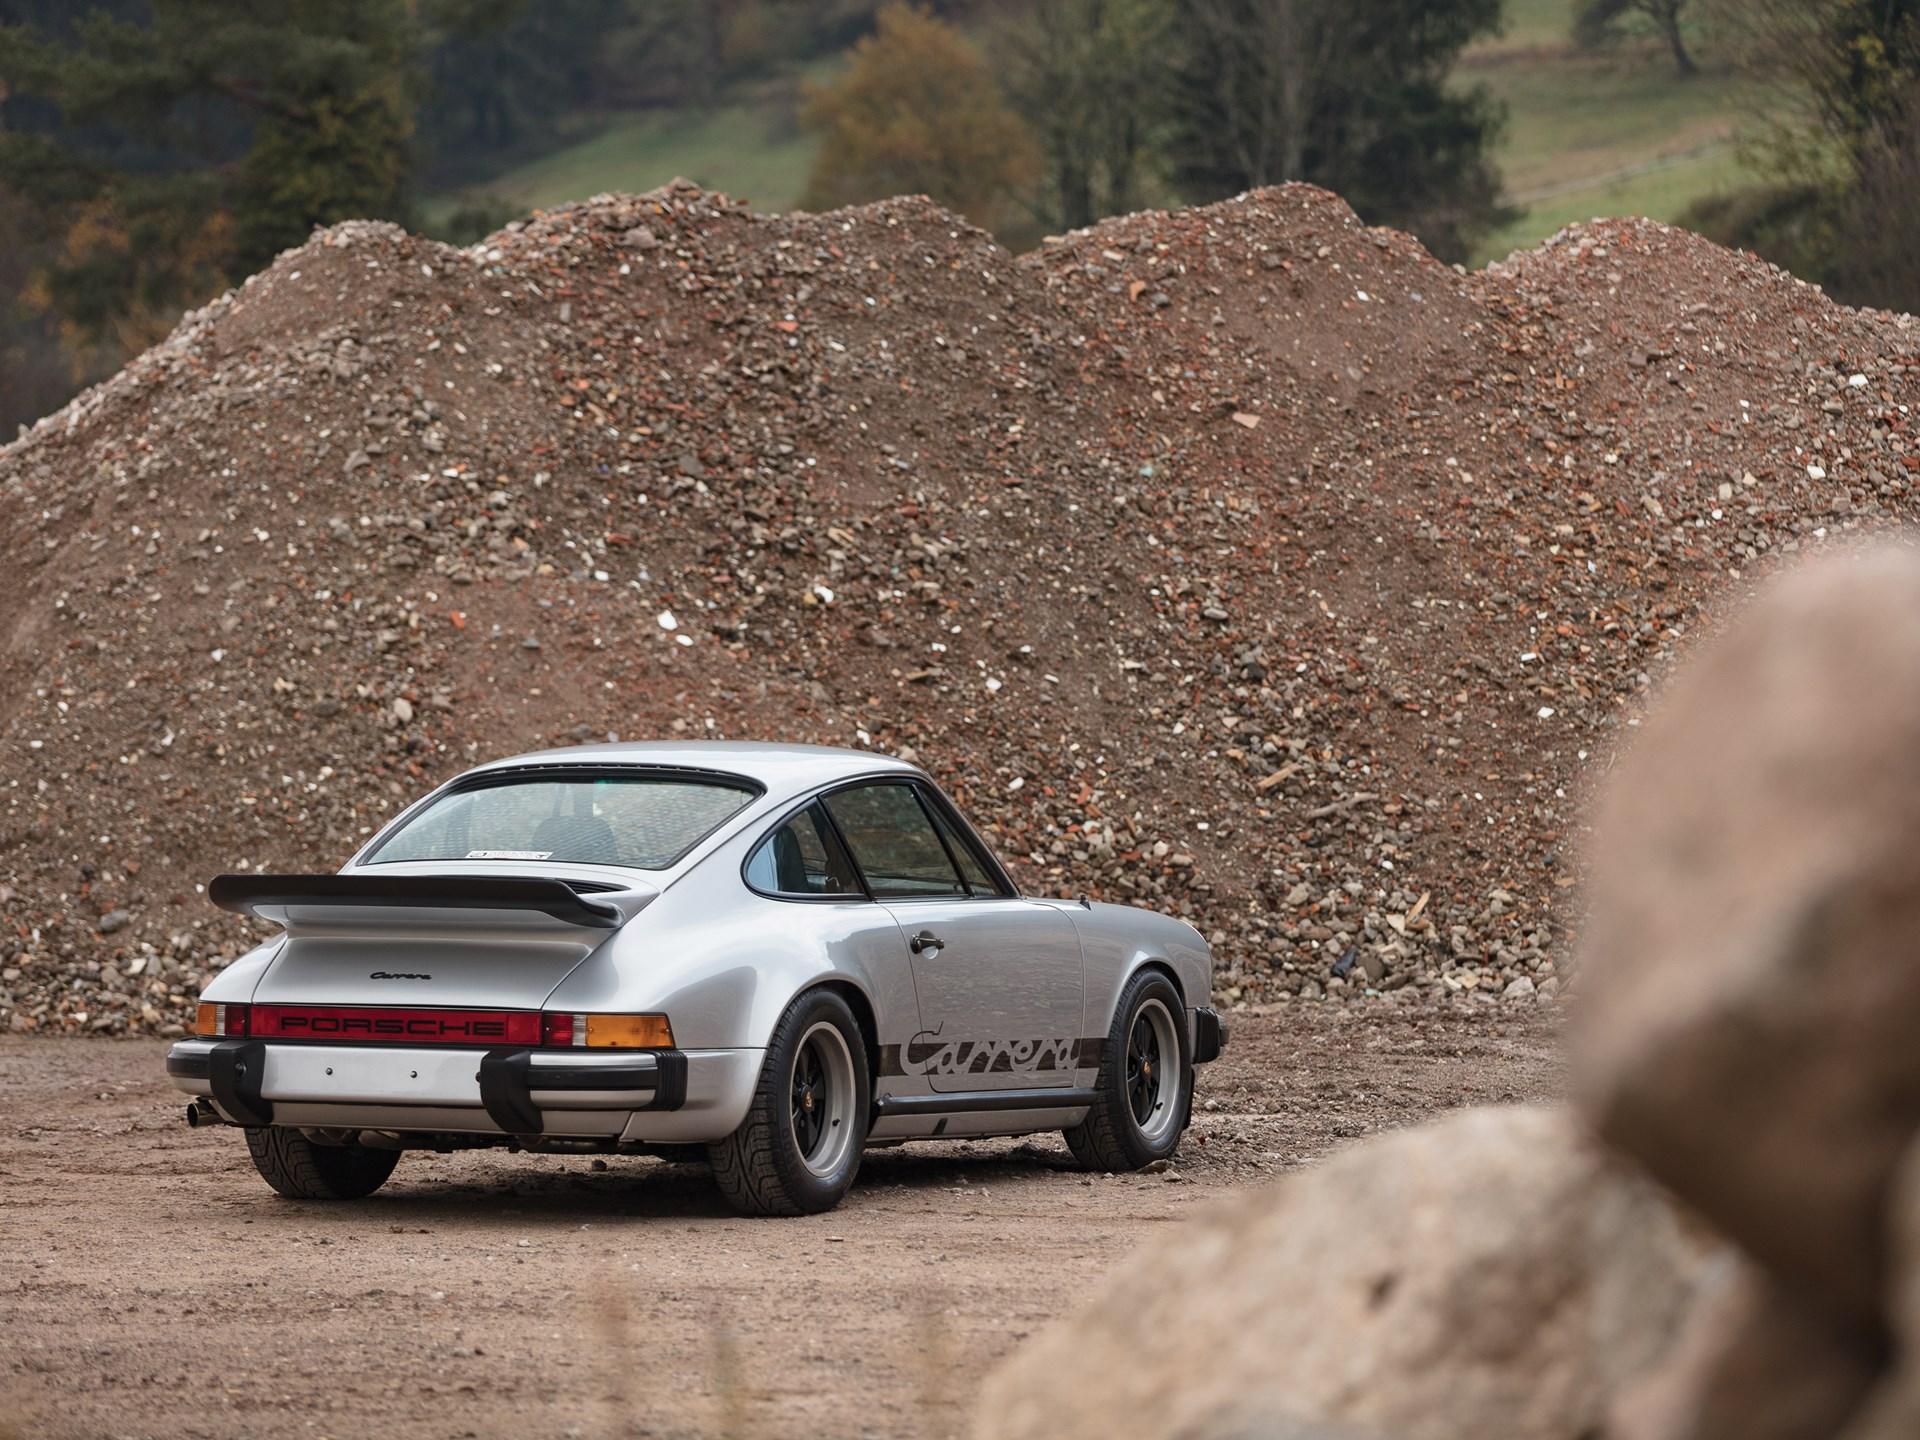 1975 Porsche 911 Carrera 2.7 MFI Jubiläum